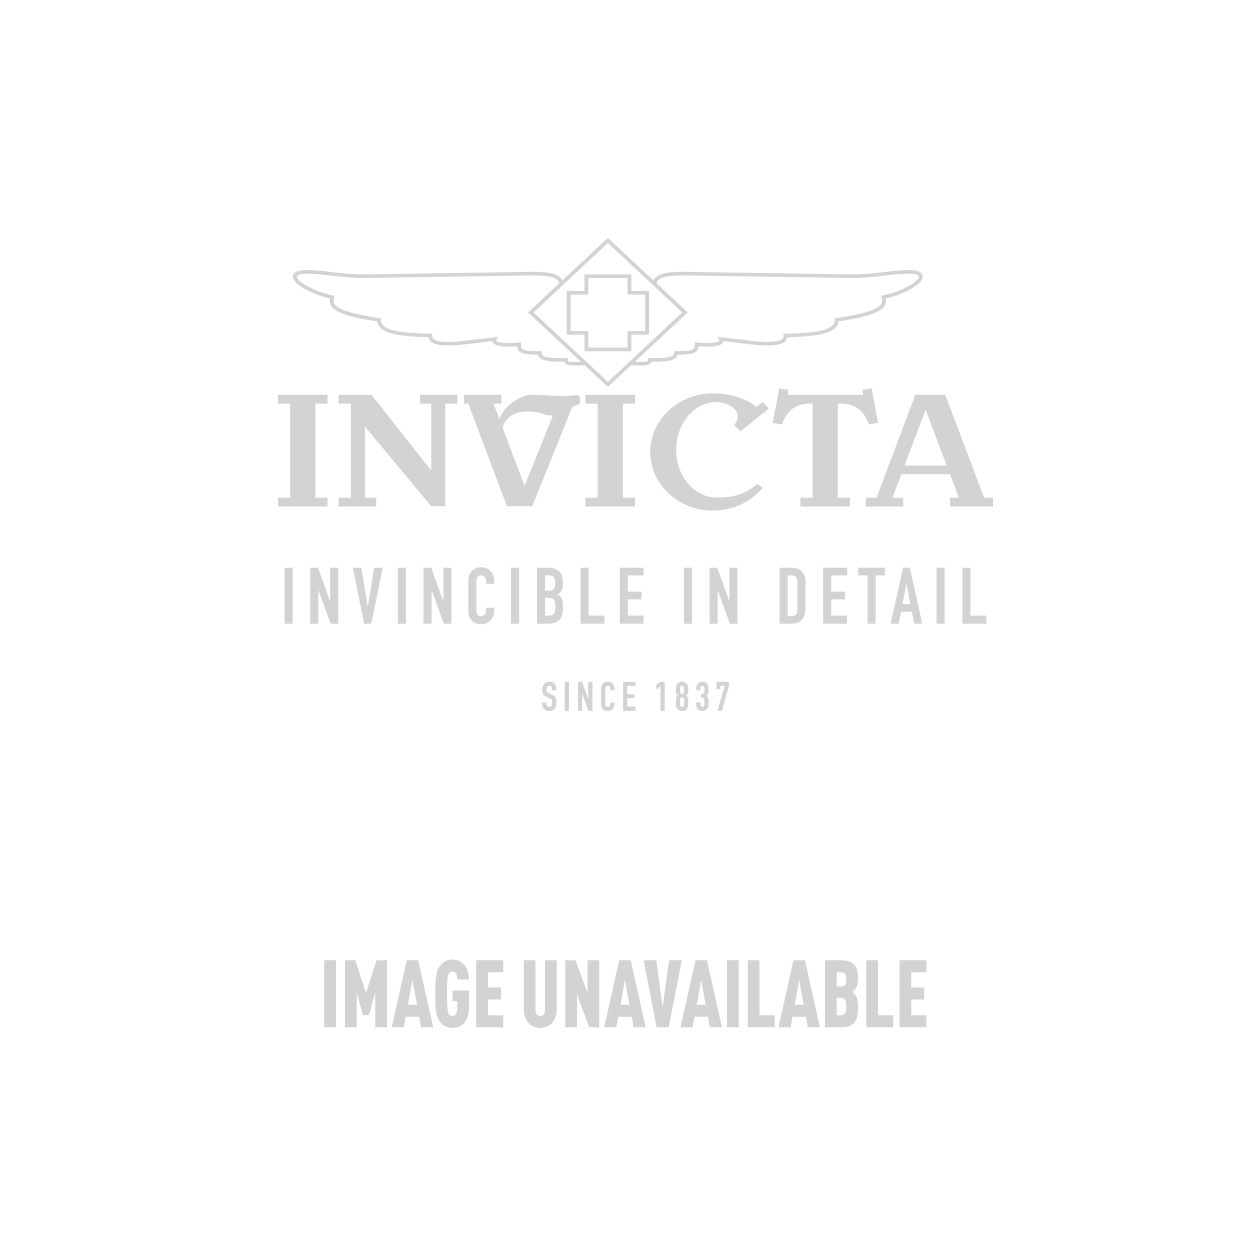 Invicta Speedway Quartz Watch - Stainless Steel case Stainless Steel band - Model 17023